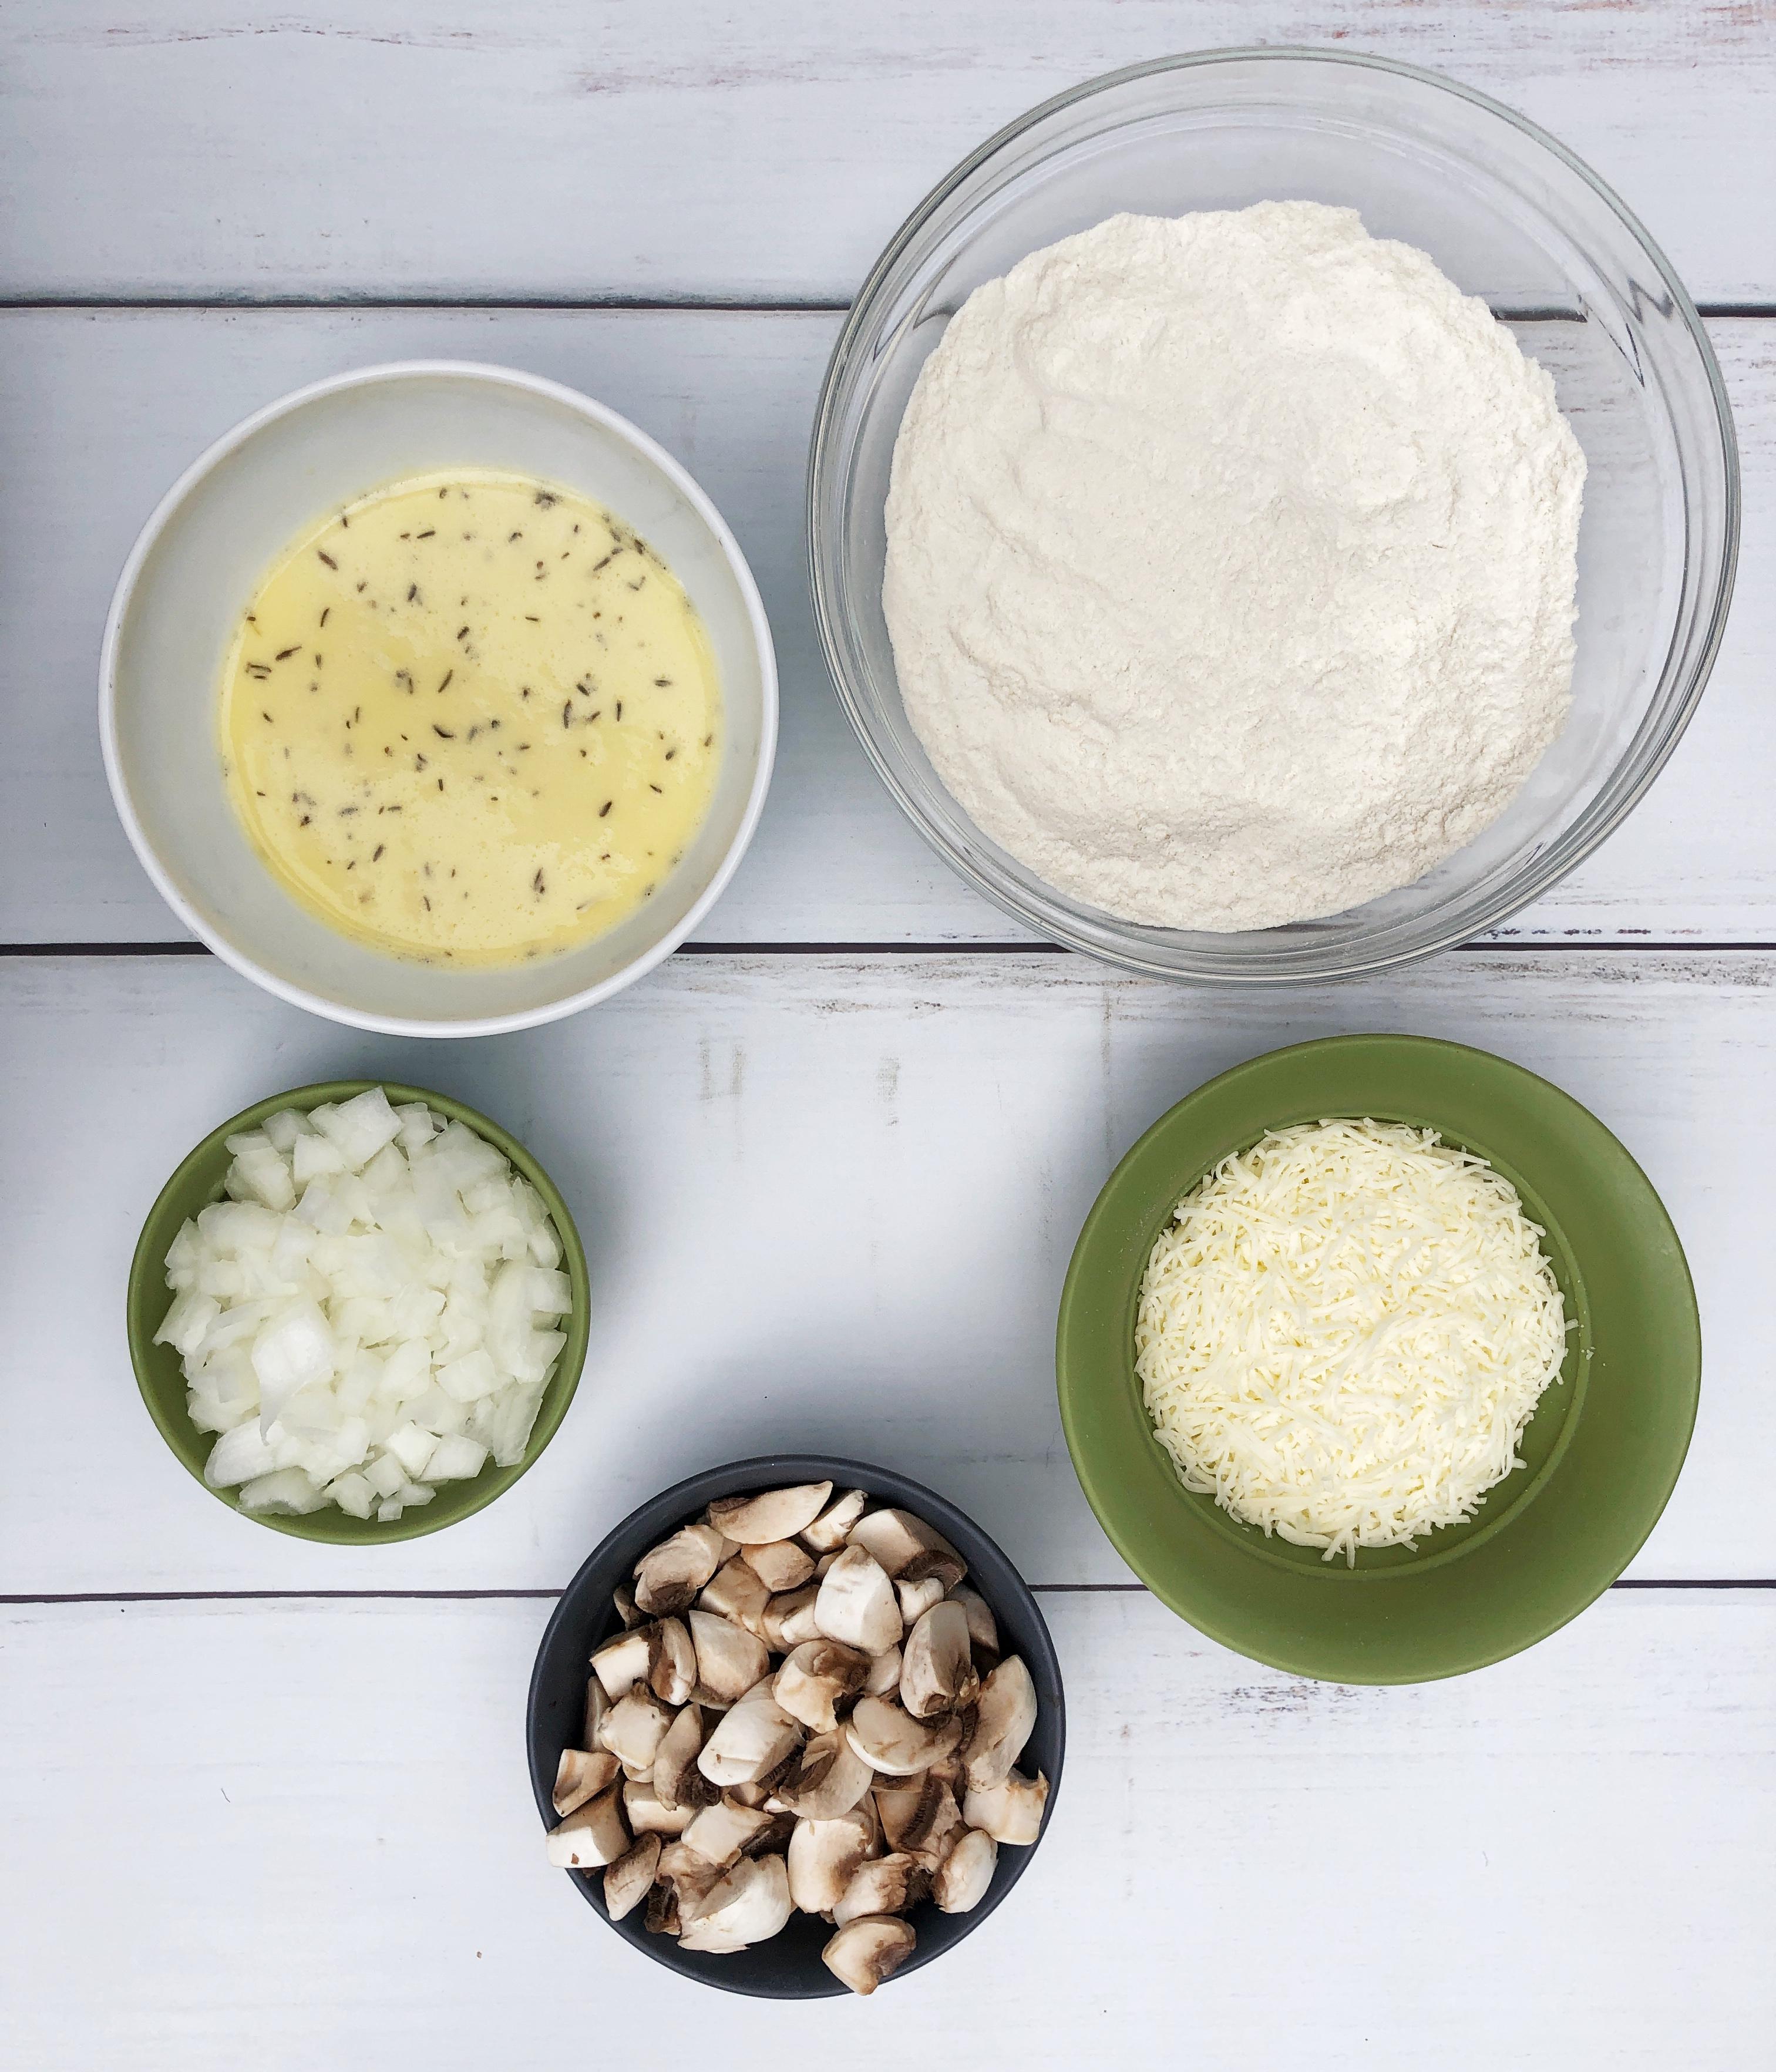 ingredients for breakfast quiche